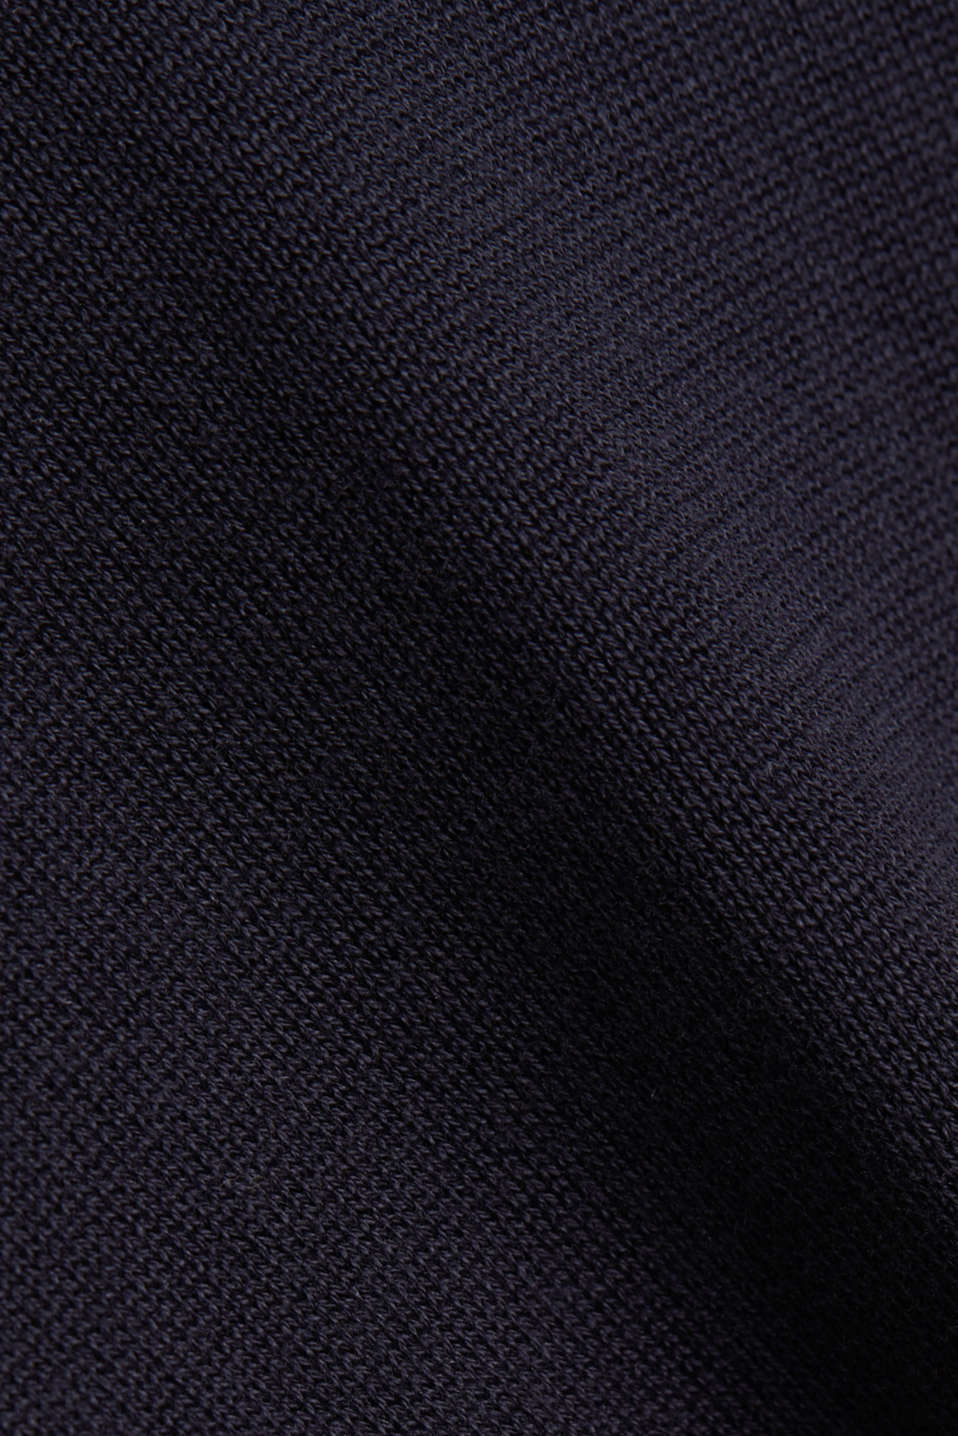 Jumper with a round neckline, 100% cotton, NAVY, detail image number 4